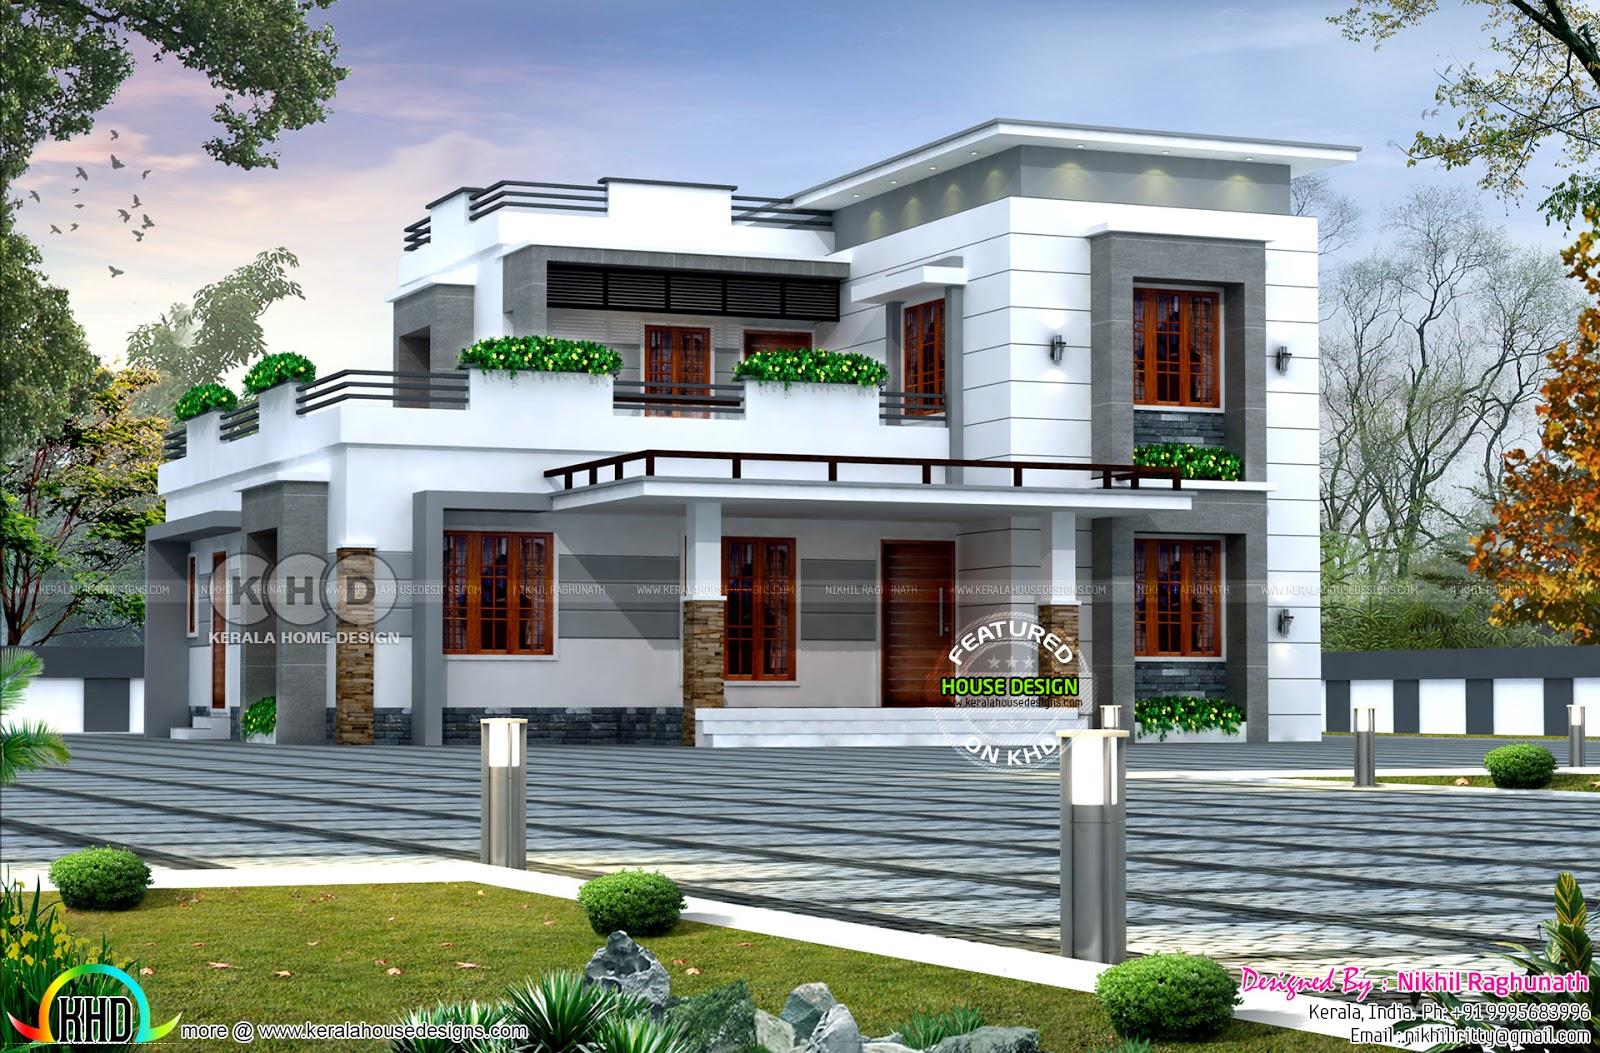 Modern flat roof home by nikhil raghunath kerala home for Flat roof house plans kerala